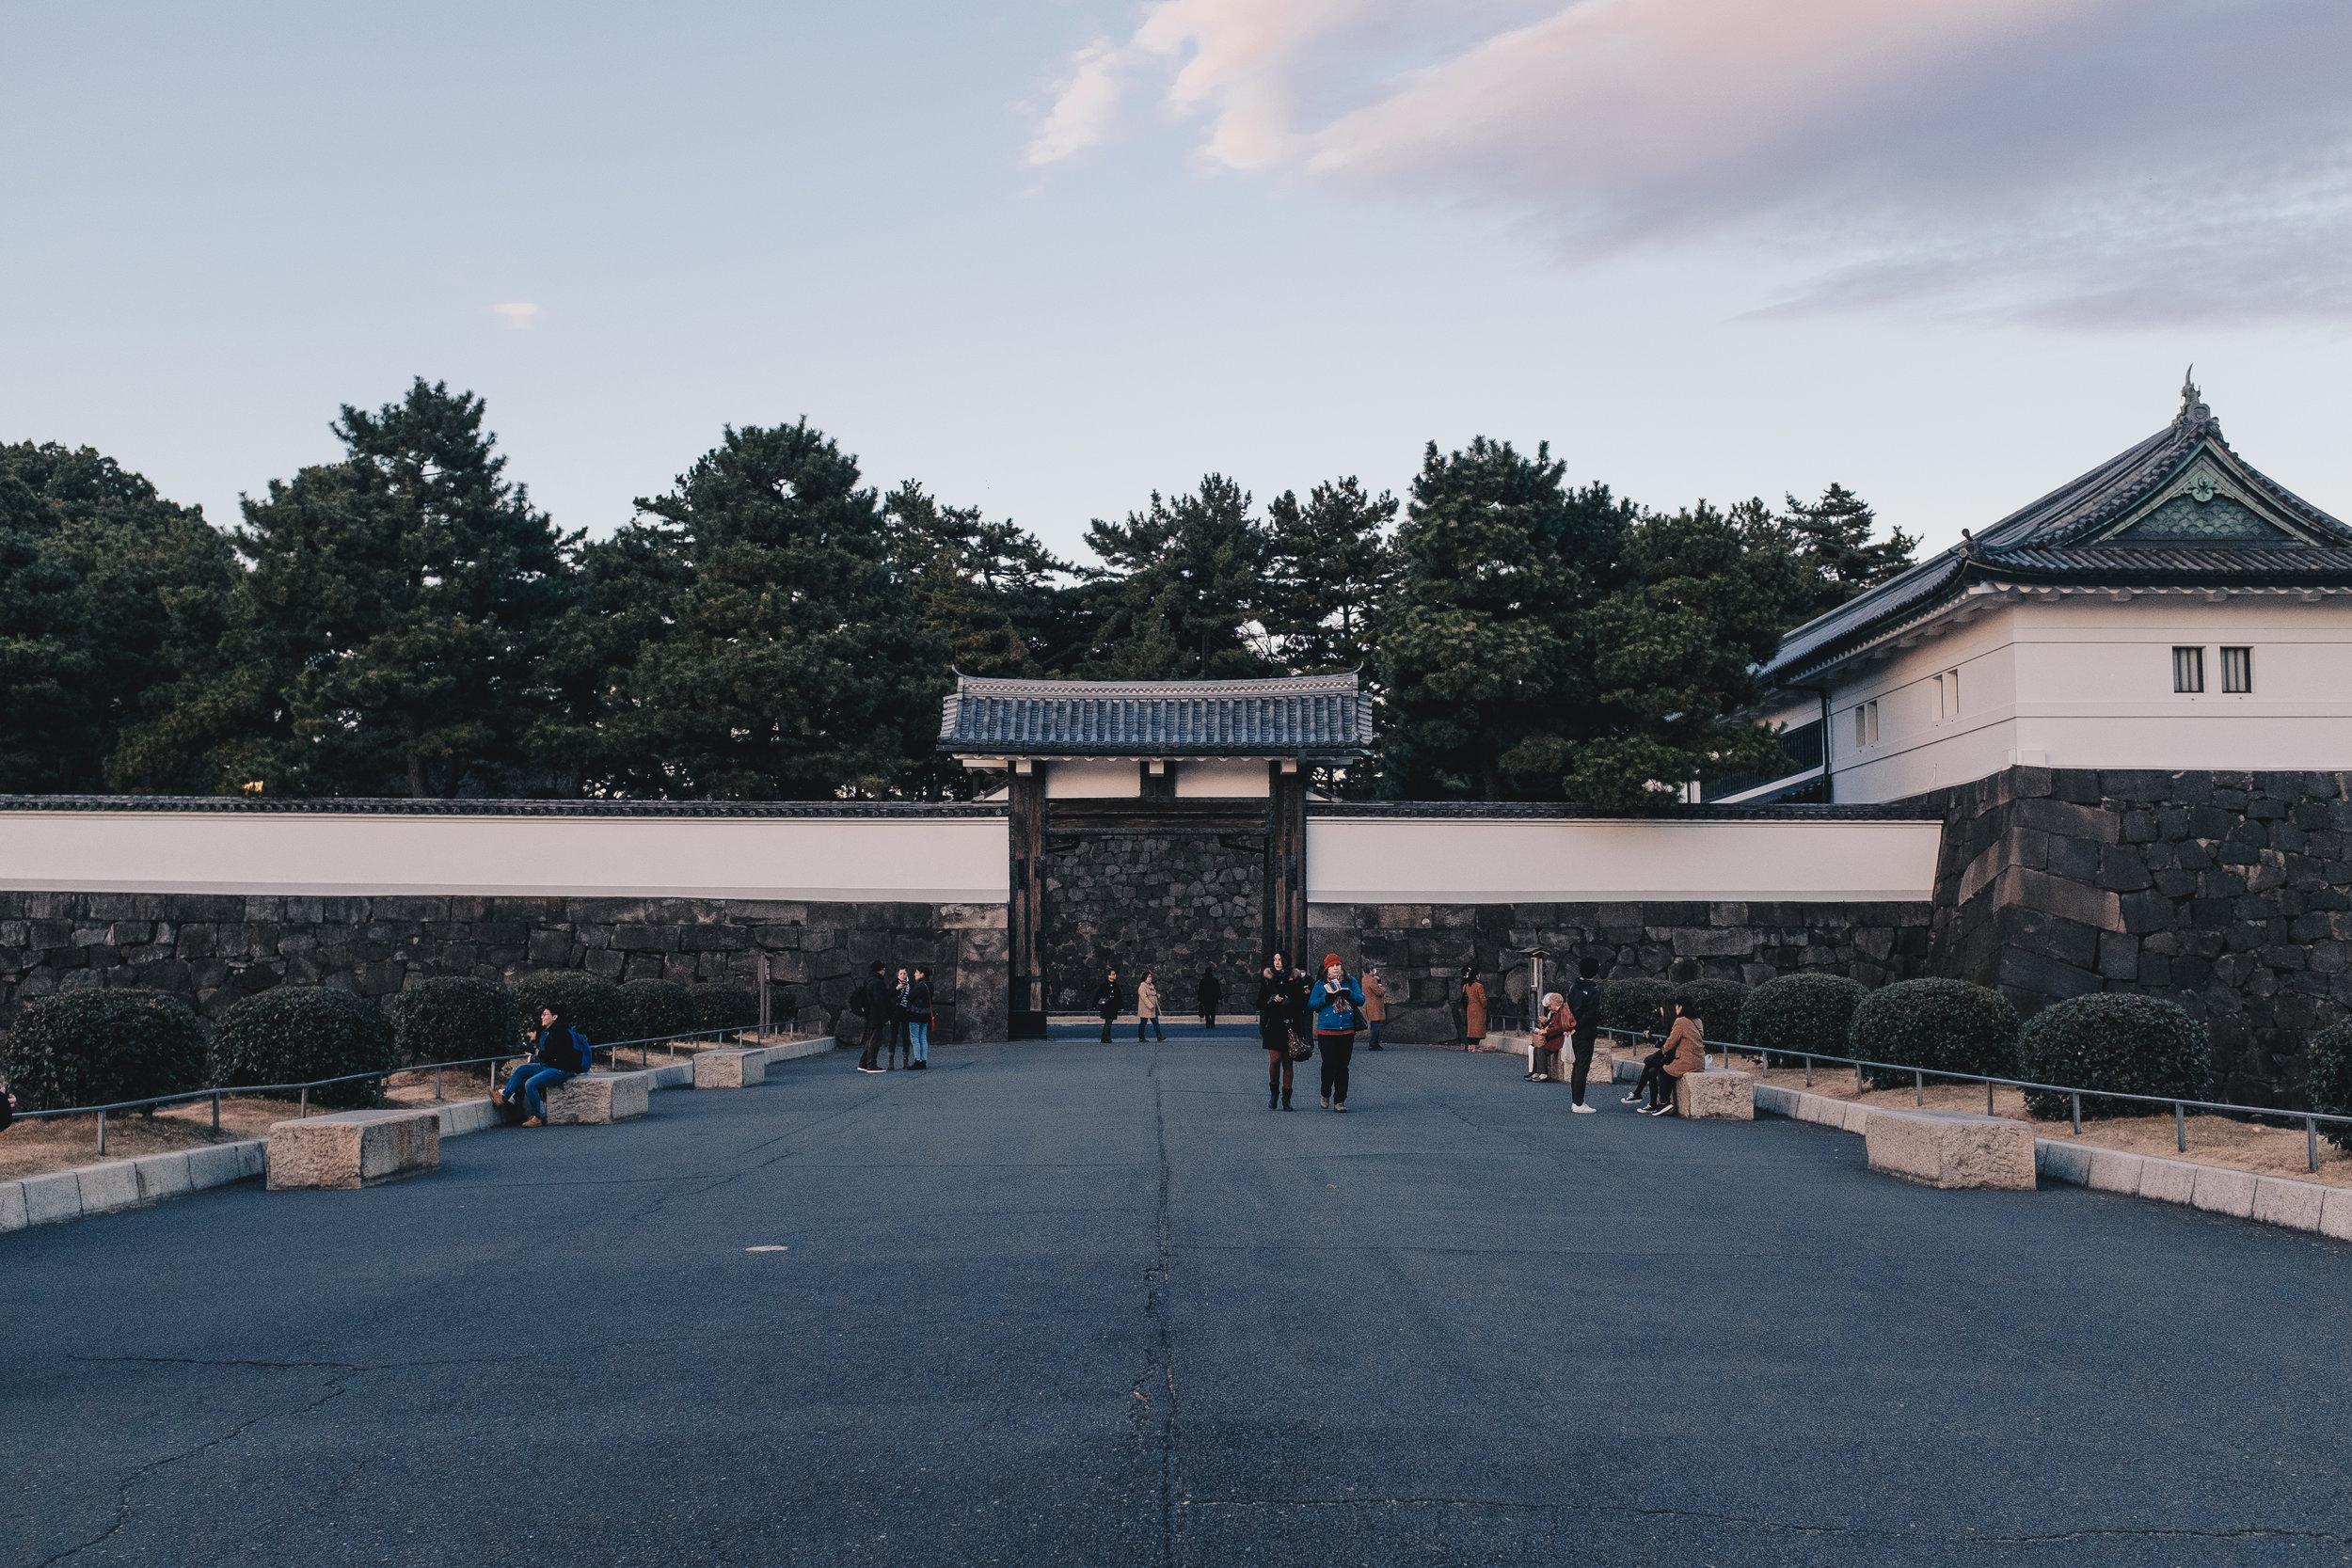 tokyo-japanese-imperial-palace.jpg